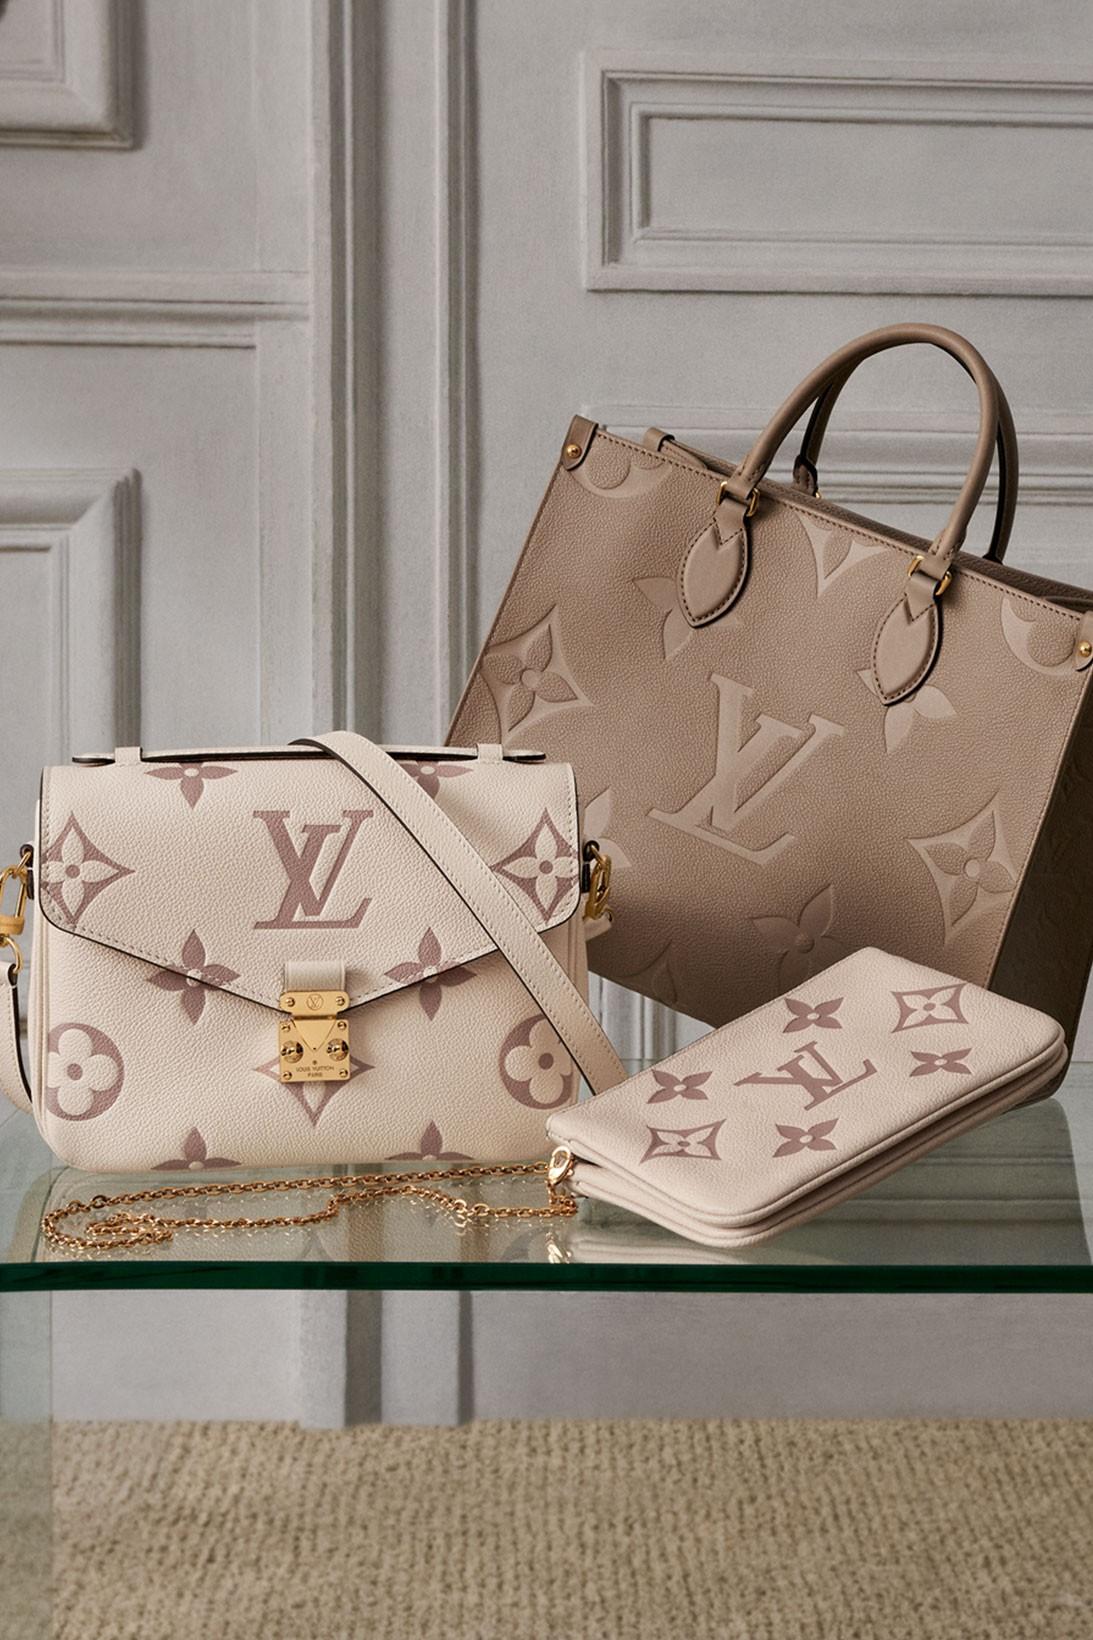 Louis vuitton monogram empreinte vanity onthego mm handbags 2021 spring summer release